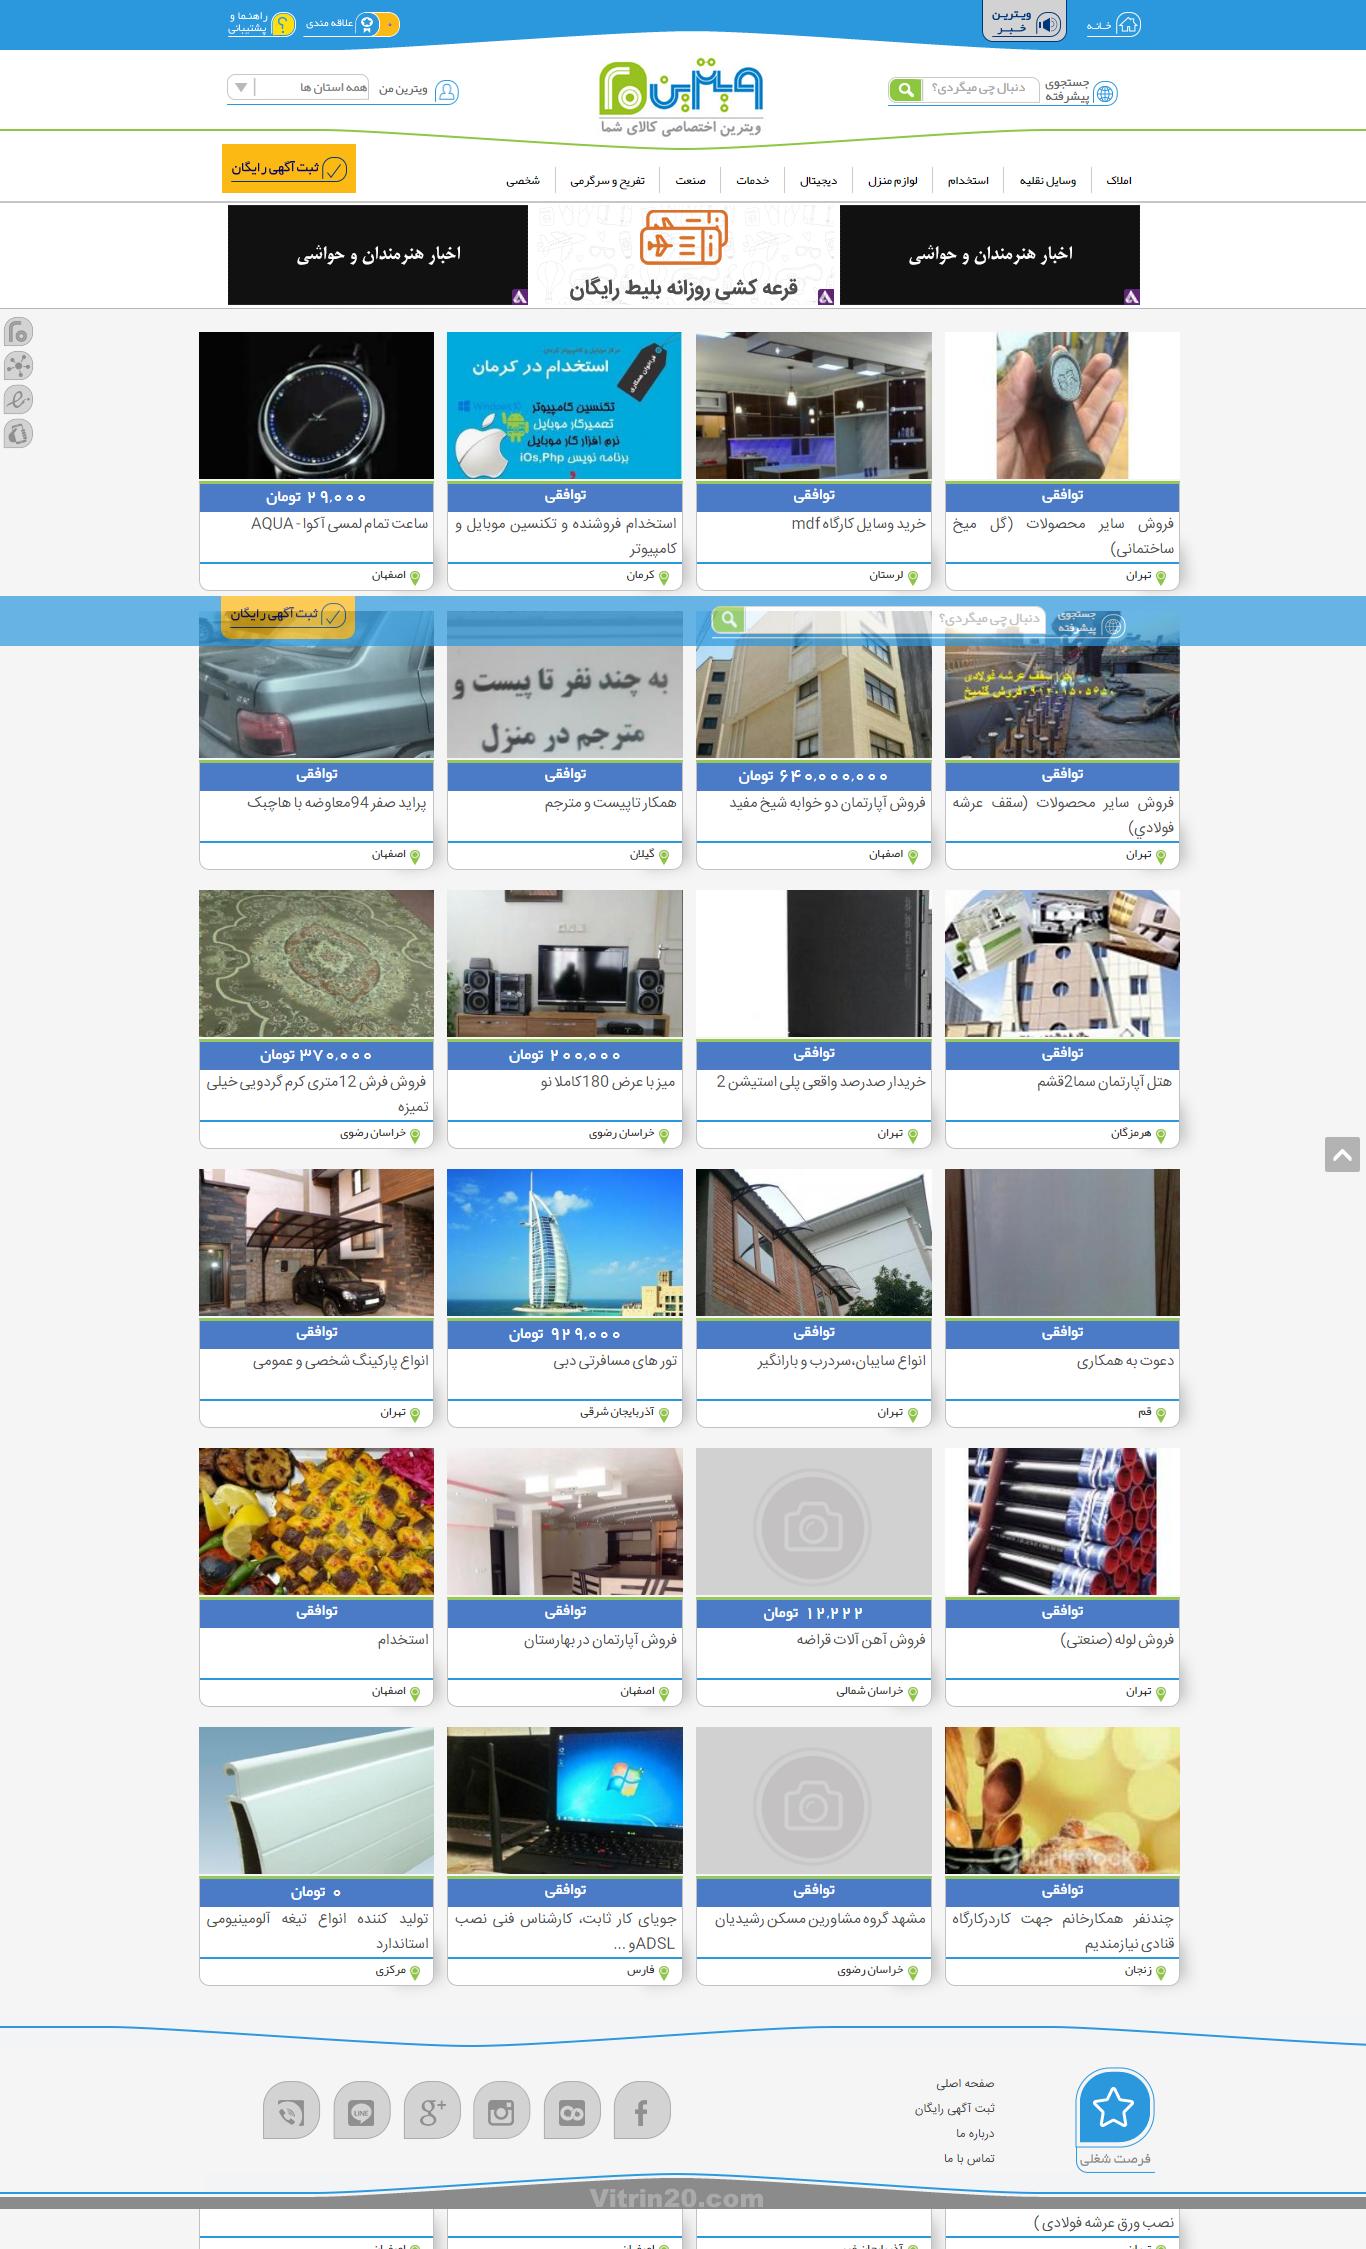 FireShot Capture 19 – ویترین۲۰ ثبت آگهی رایگان – http___vitrin20.ir_home